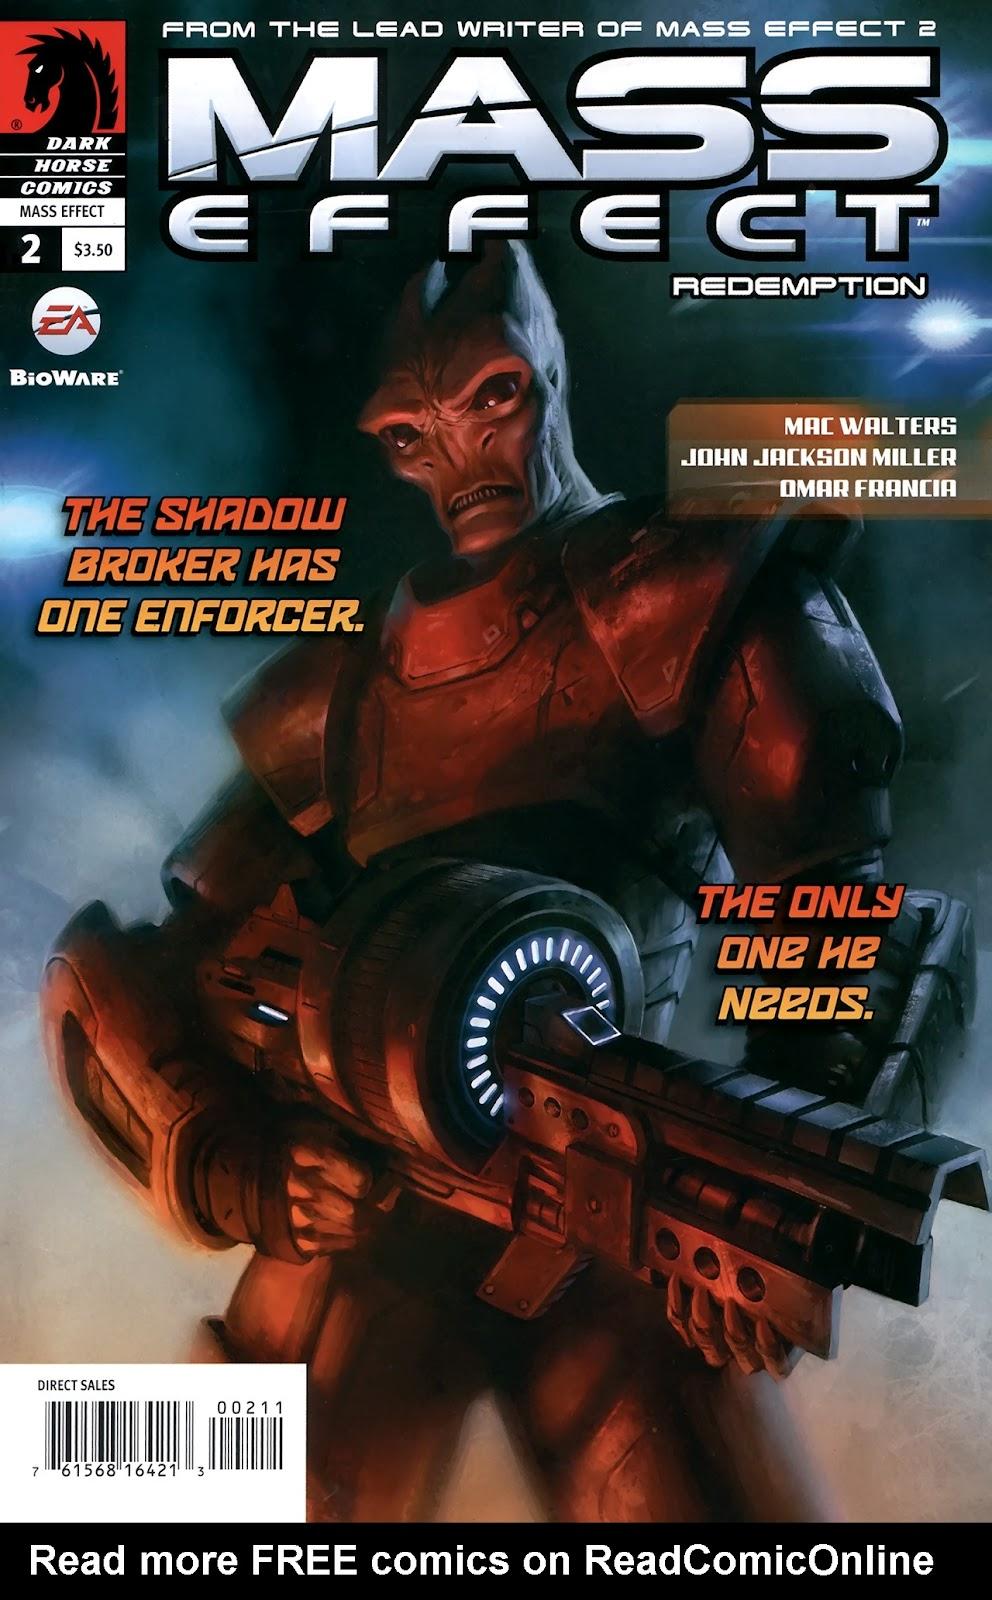 Mass Effect Redemption #2